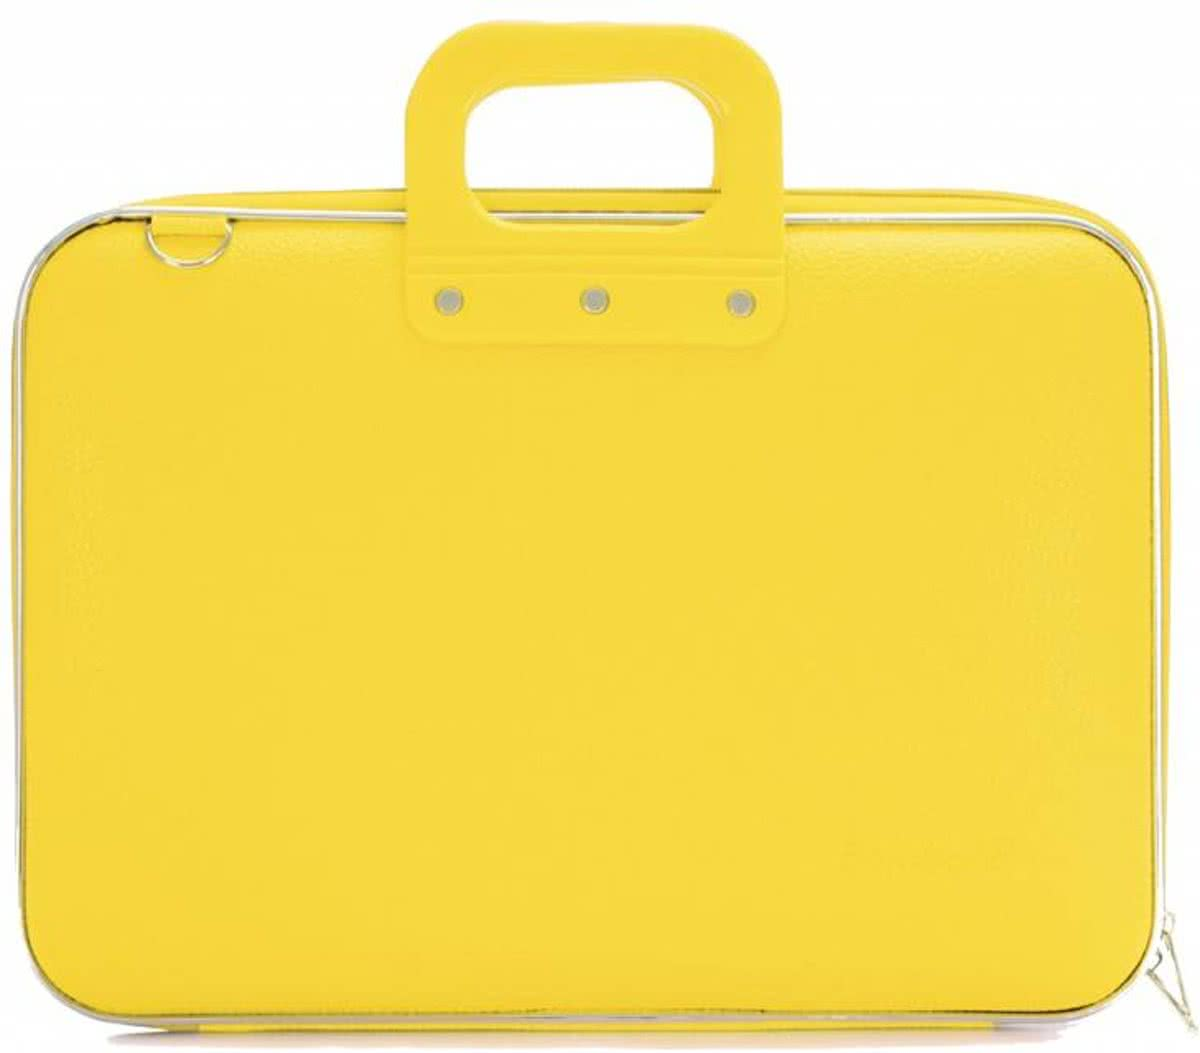 3a62cc13f1a Bombata CLASSIC LAPTOP CASE - Laptoptas – 15,6 inch / Mandarijn geel ...